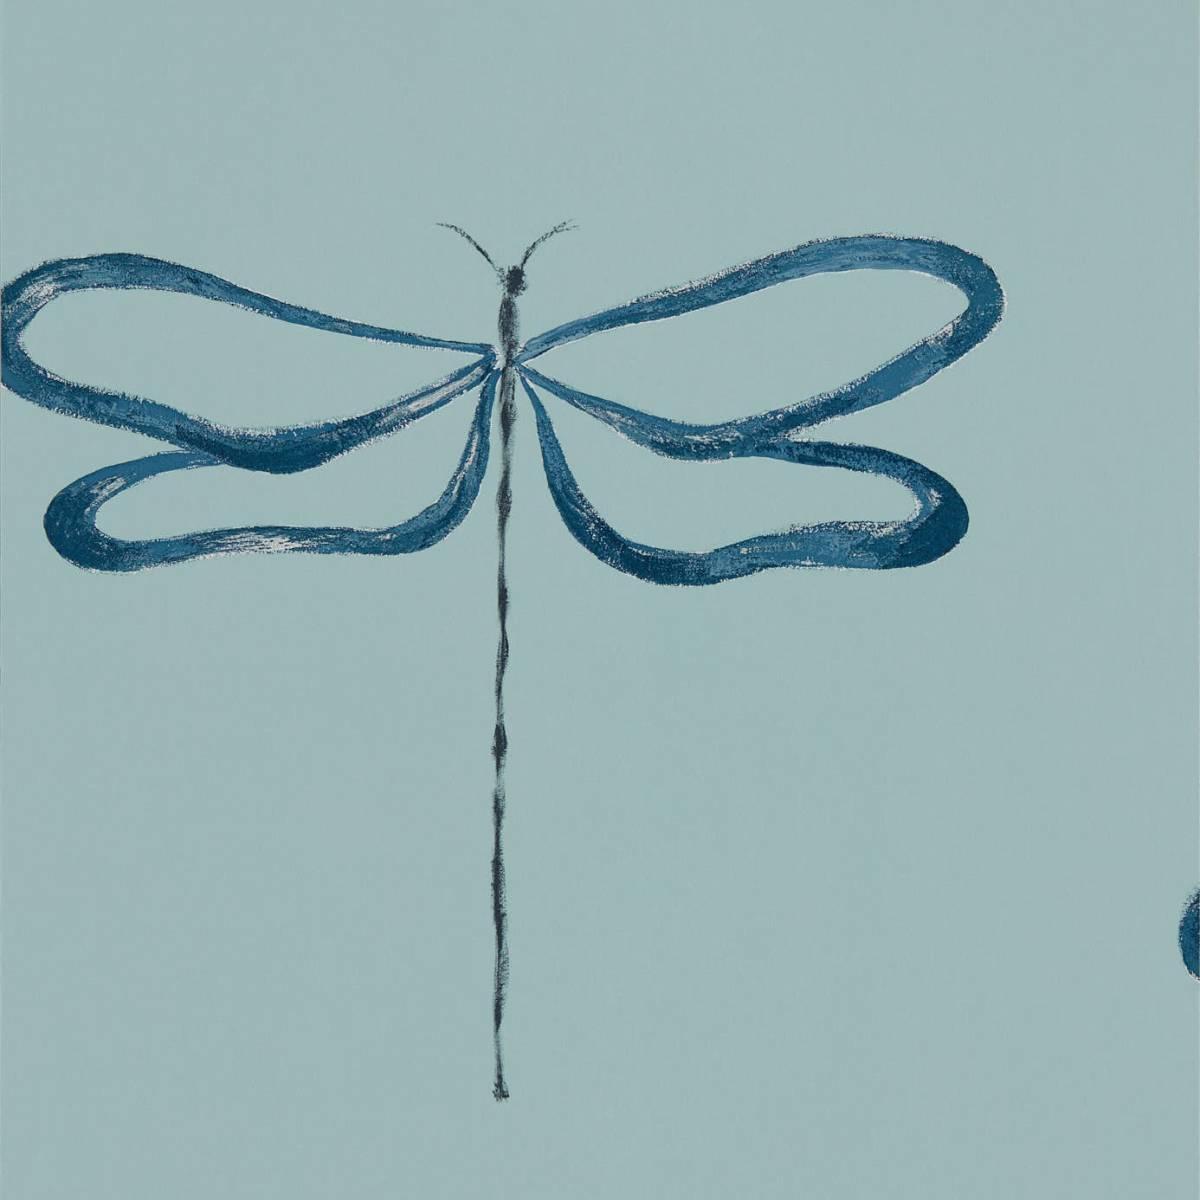 Dragonfly Wallpaper - Marine (111931) - Scion Japandi ...